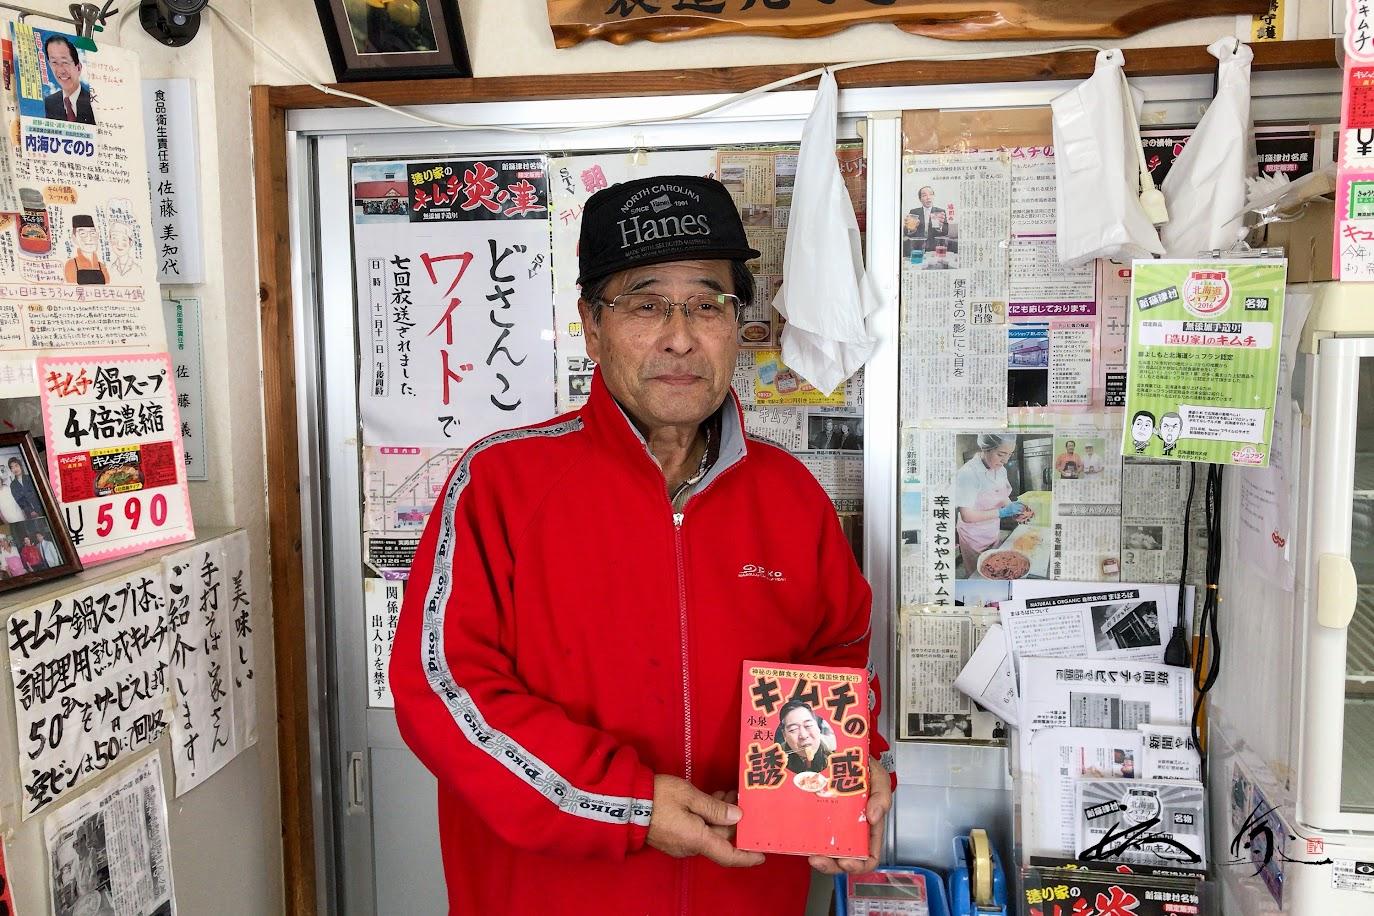 (有)実勇産業代表取締役 佐藤勇さん